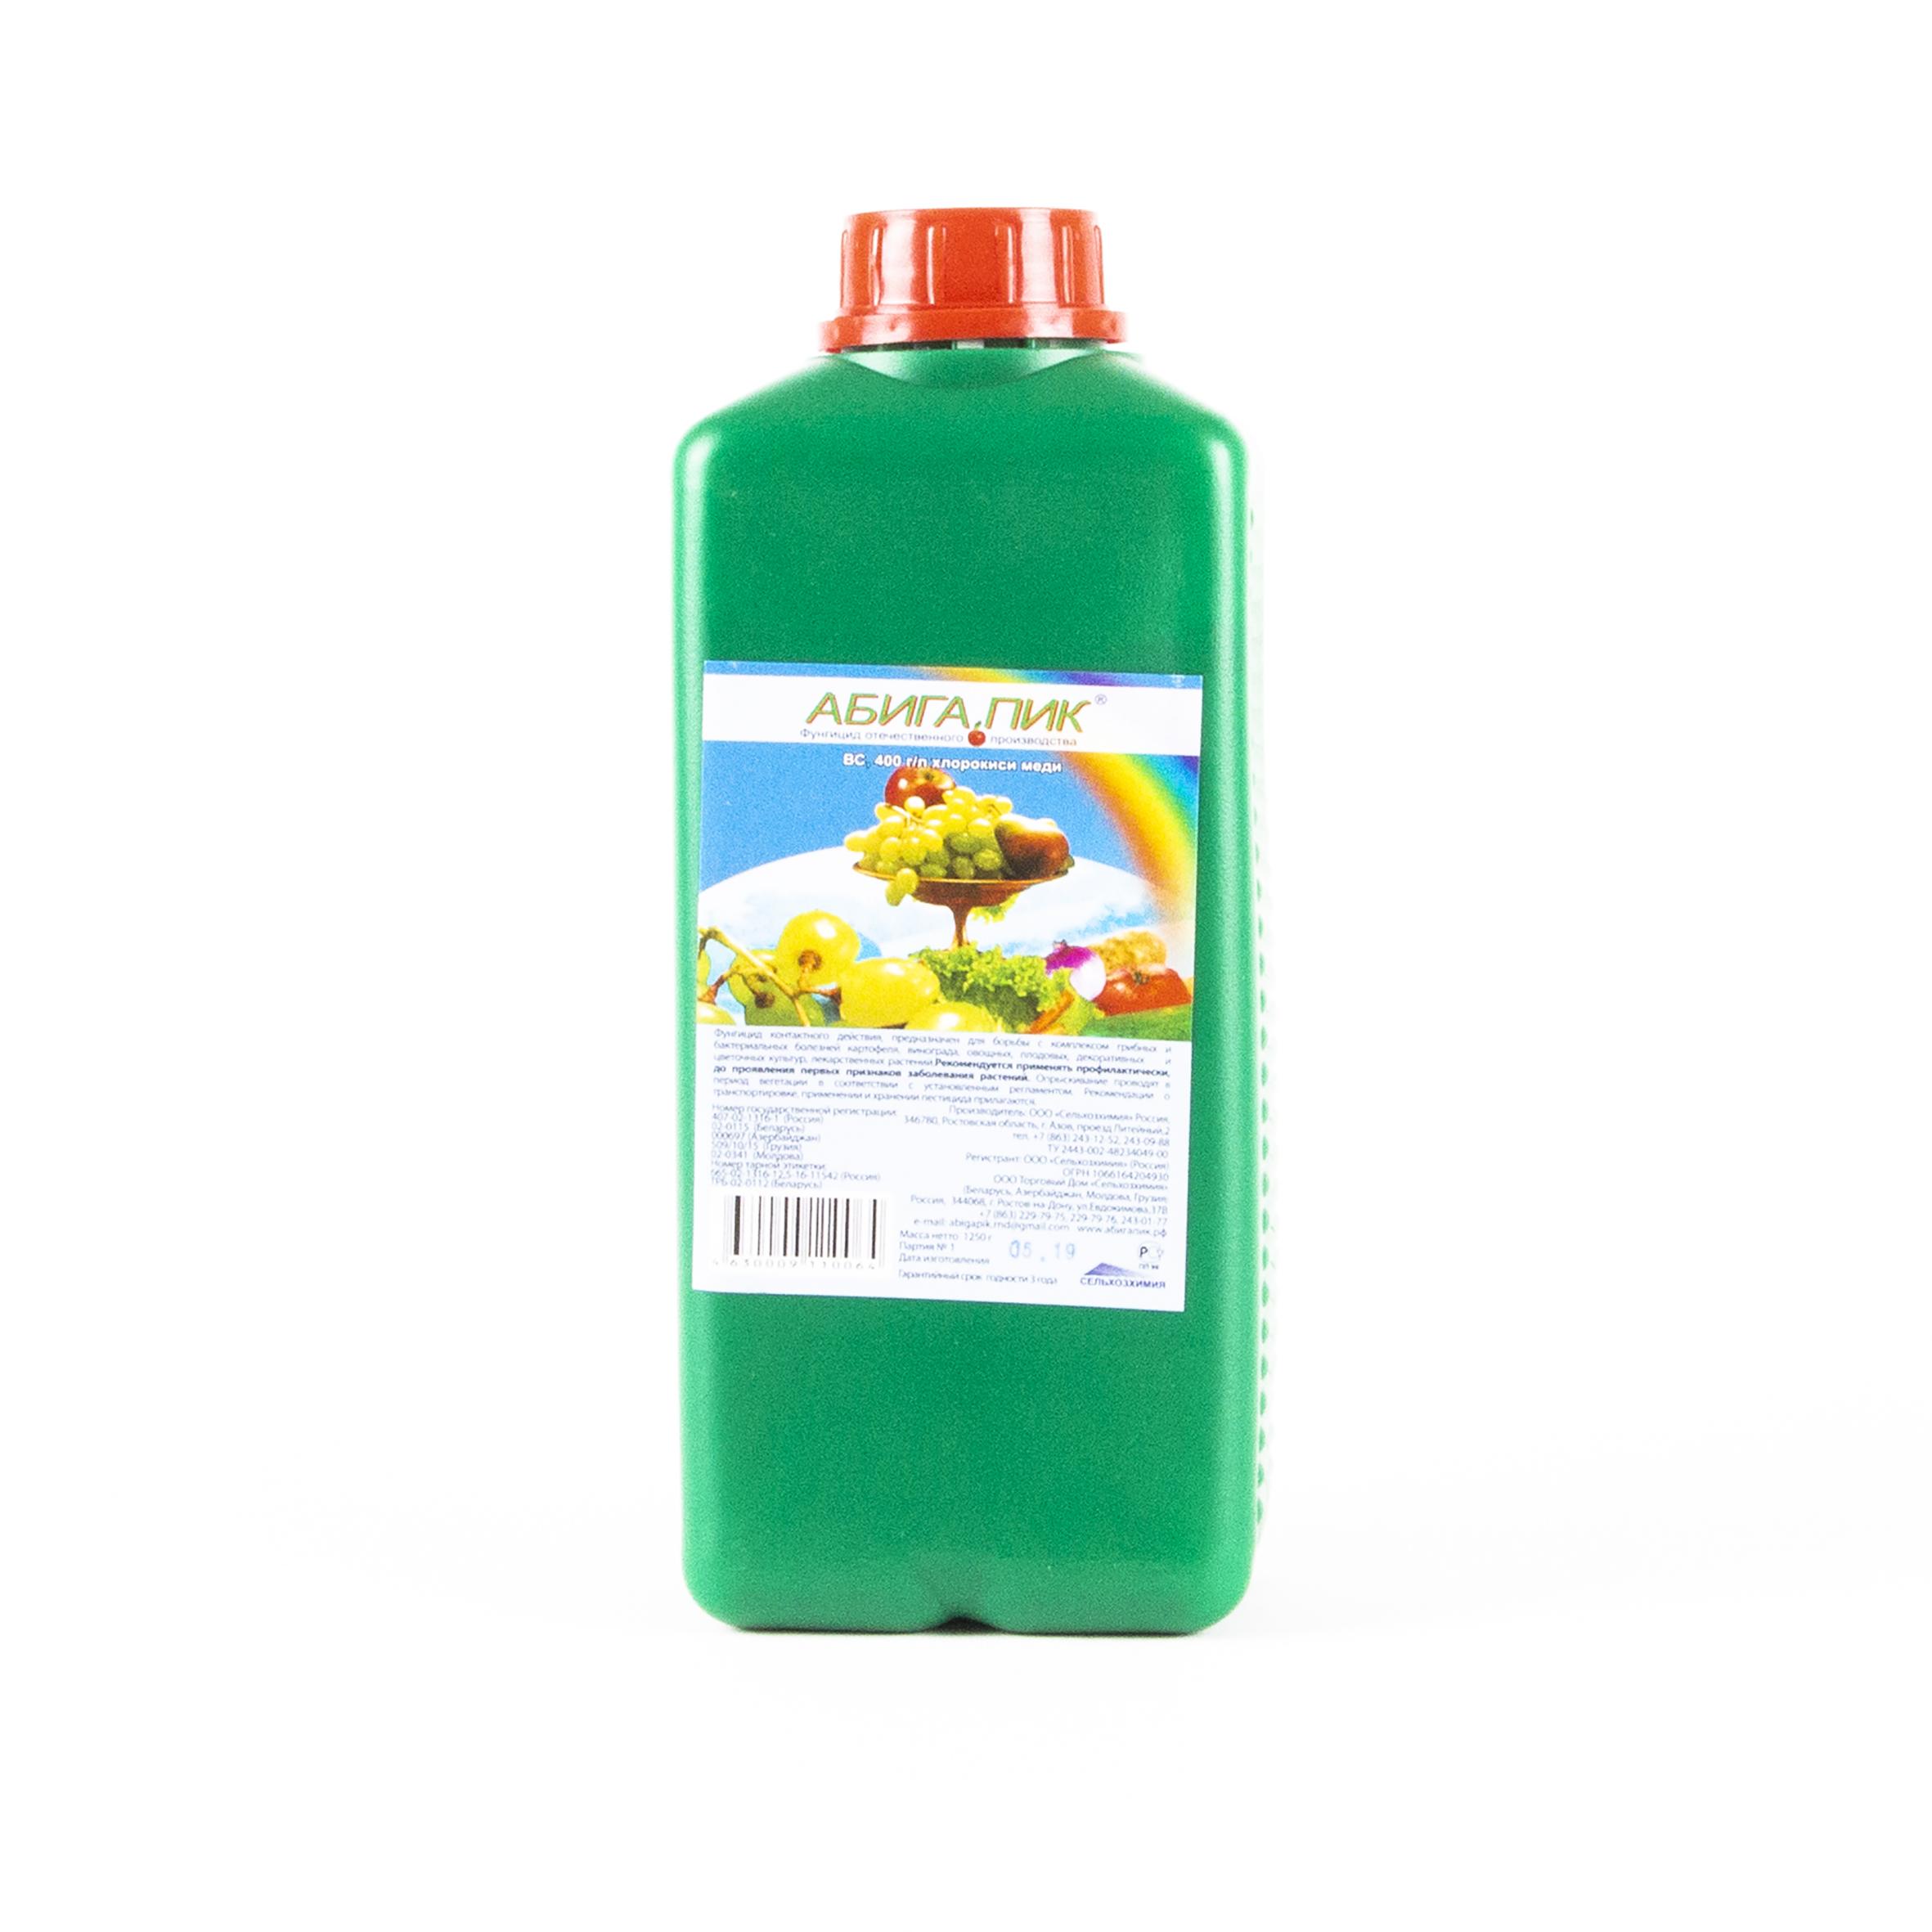 Абига-пик, вс (фунгициды, пестициды) — agroxxi